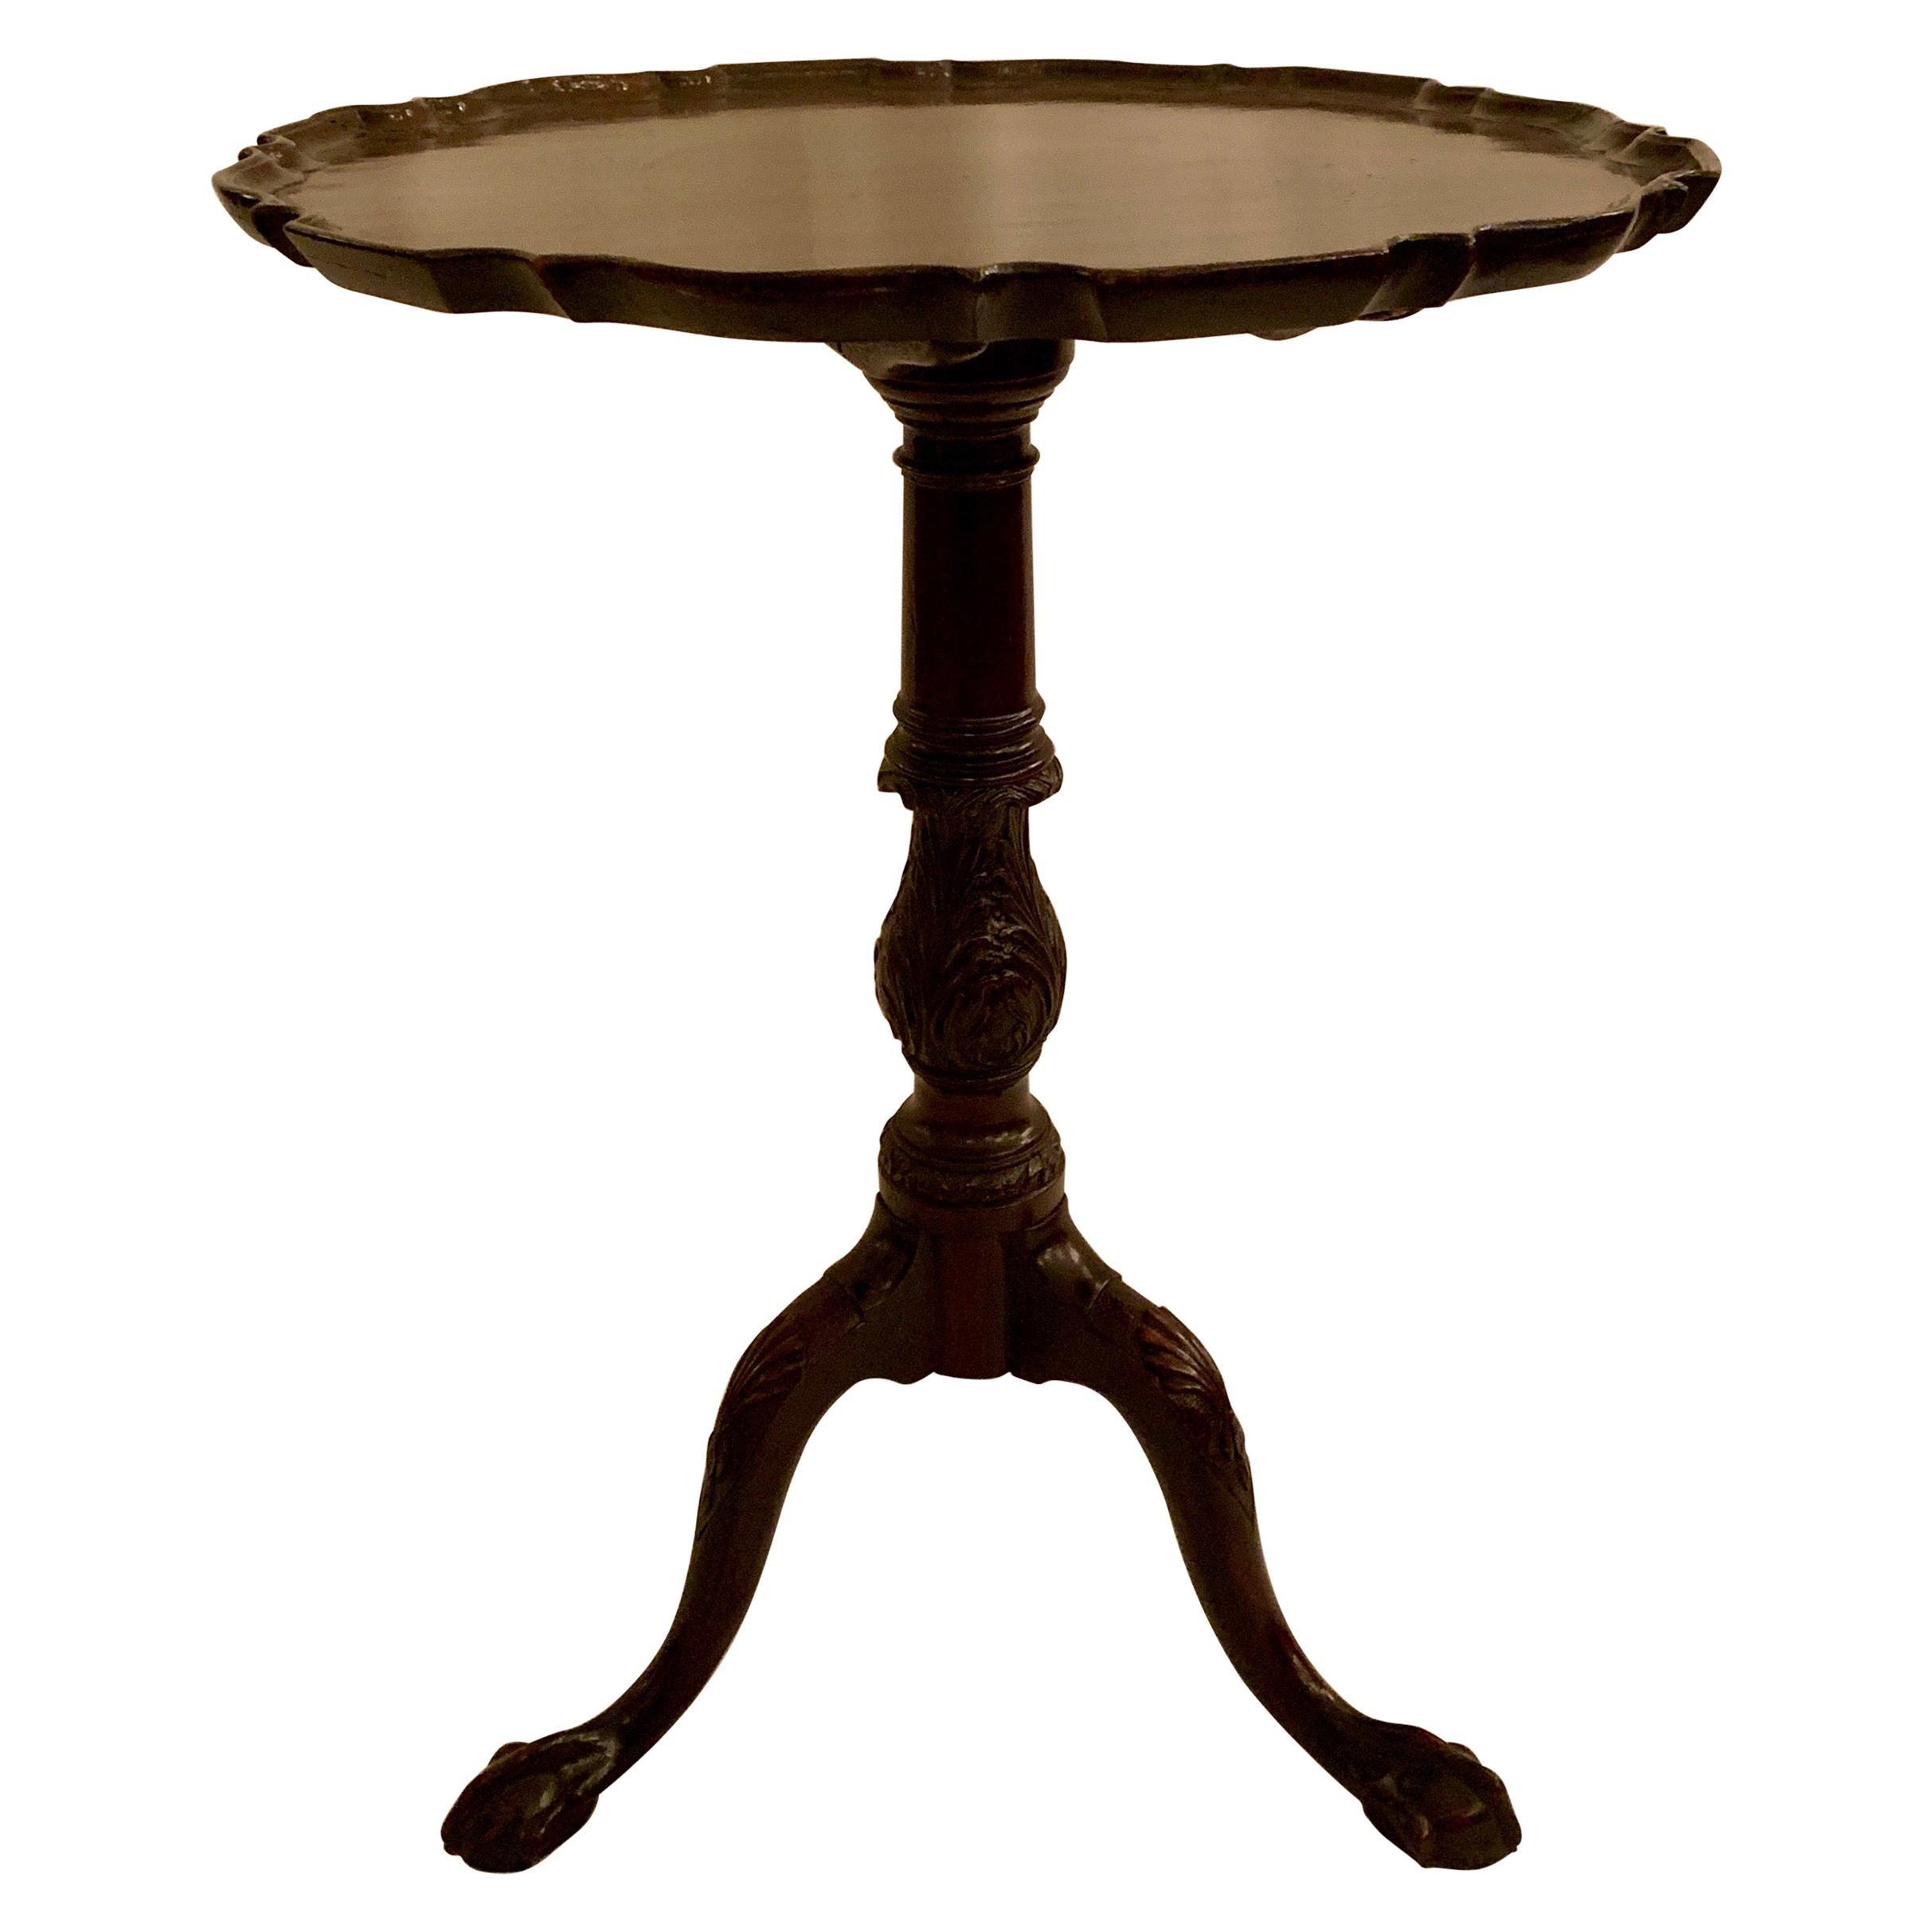 Antique English Mahogany Pie Crust Table, Late 19th Century